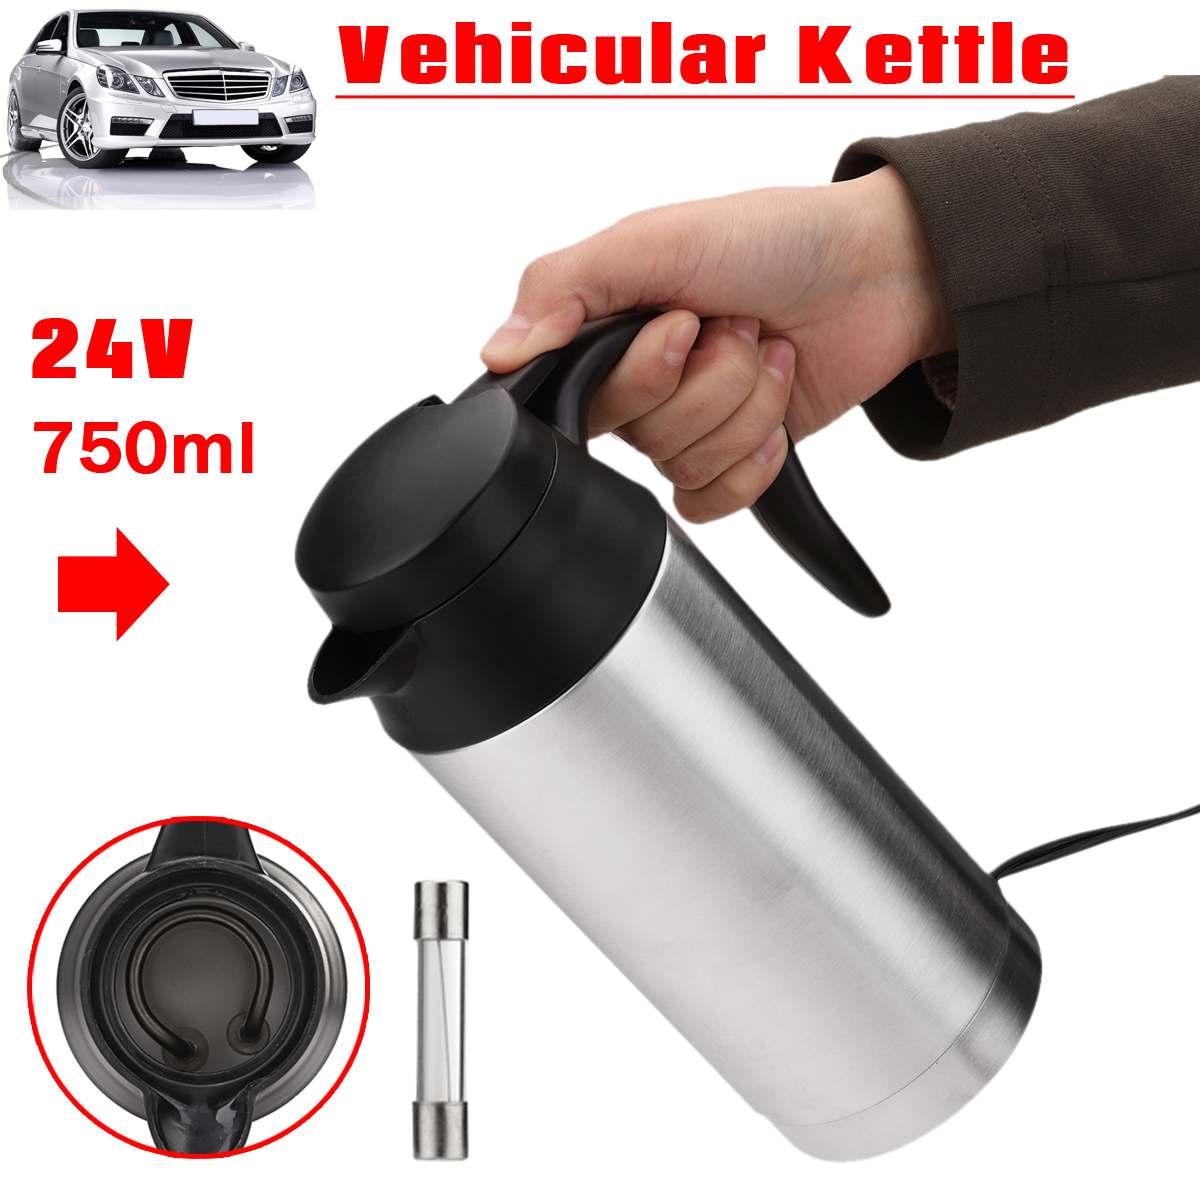 Hervidor eléctrico de 750ml en el coche hervidor portátil hervidor de agua caliente de acero inoxidable Universal 24V café, Té